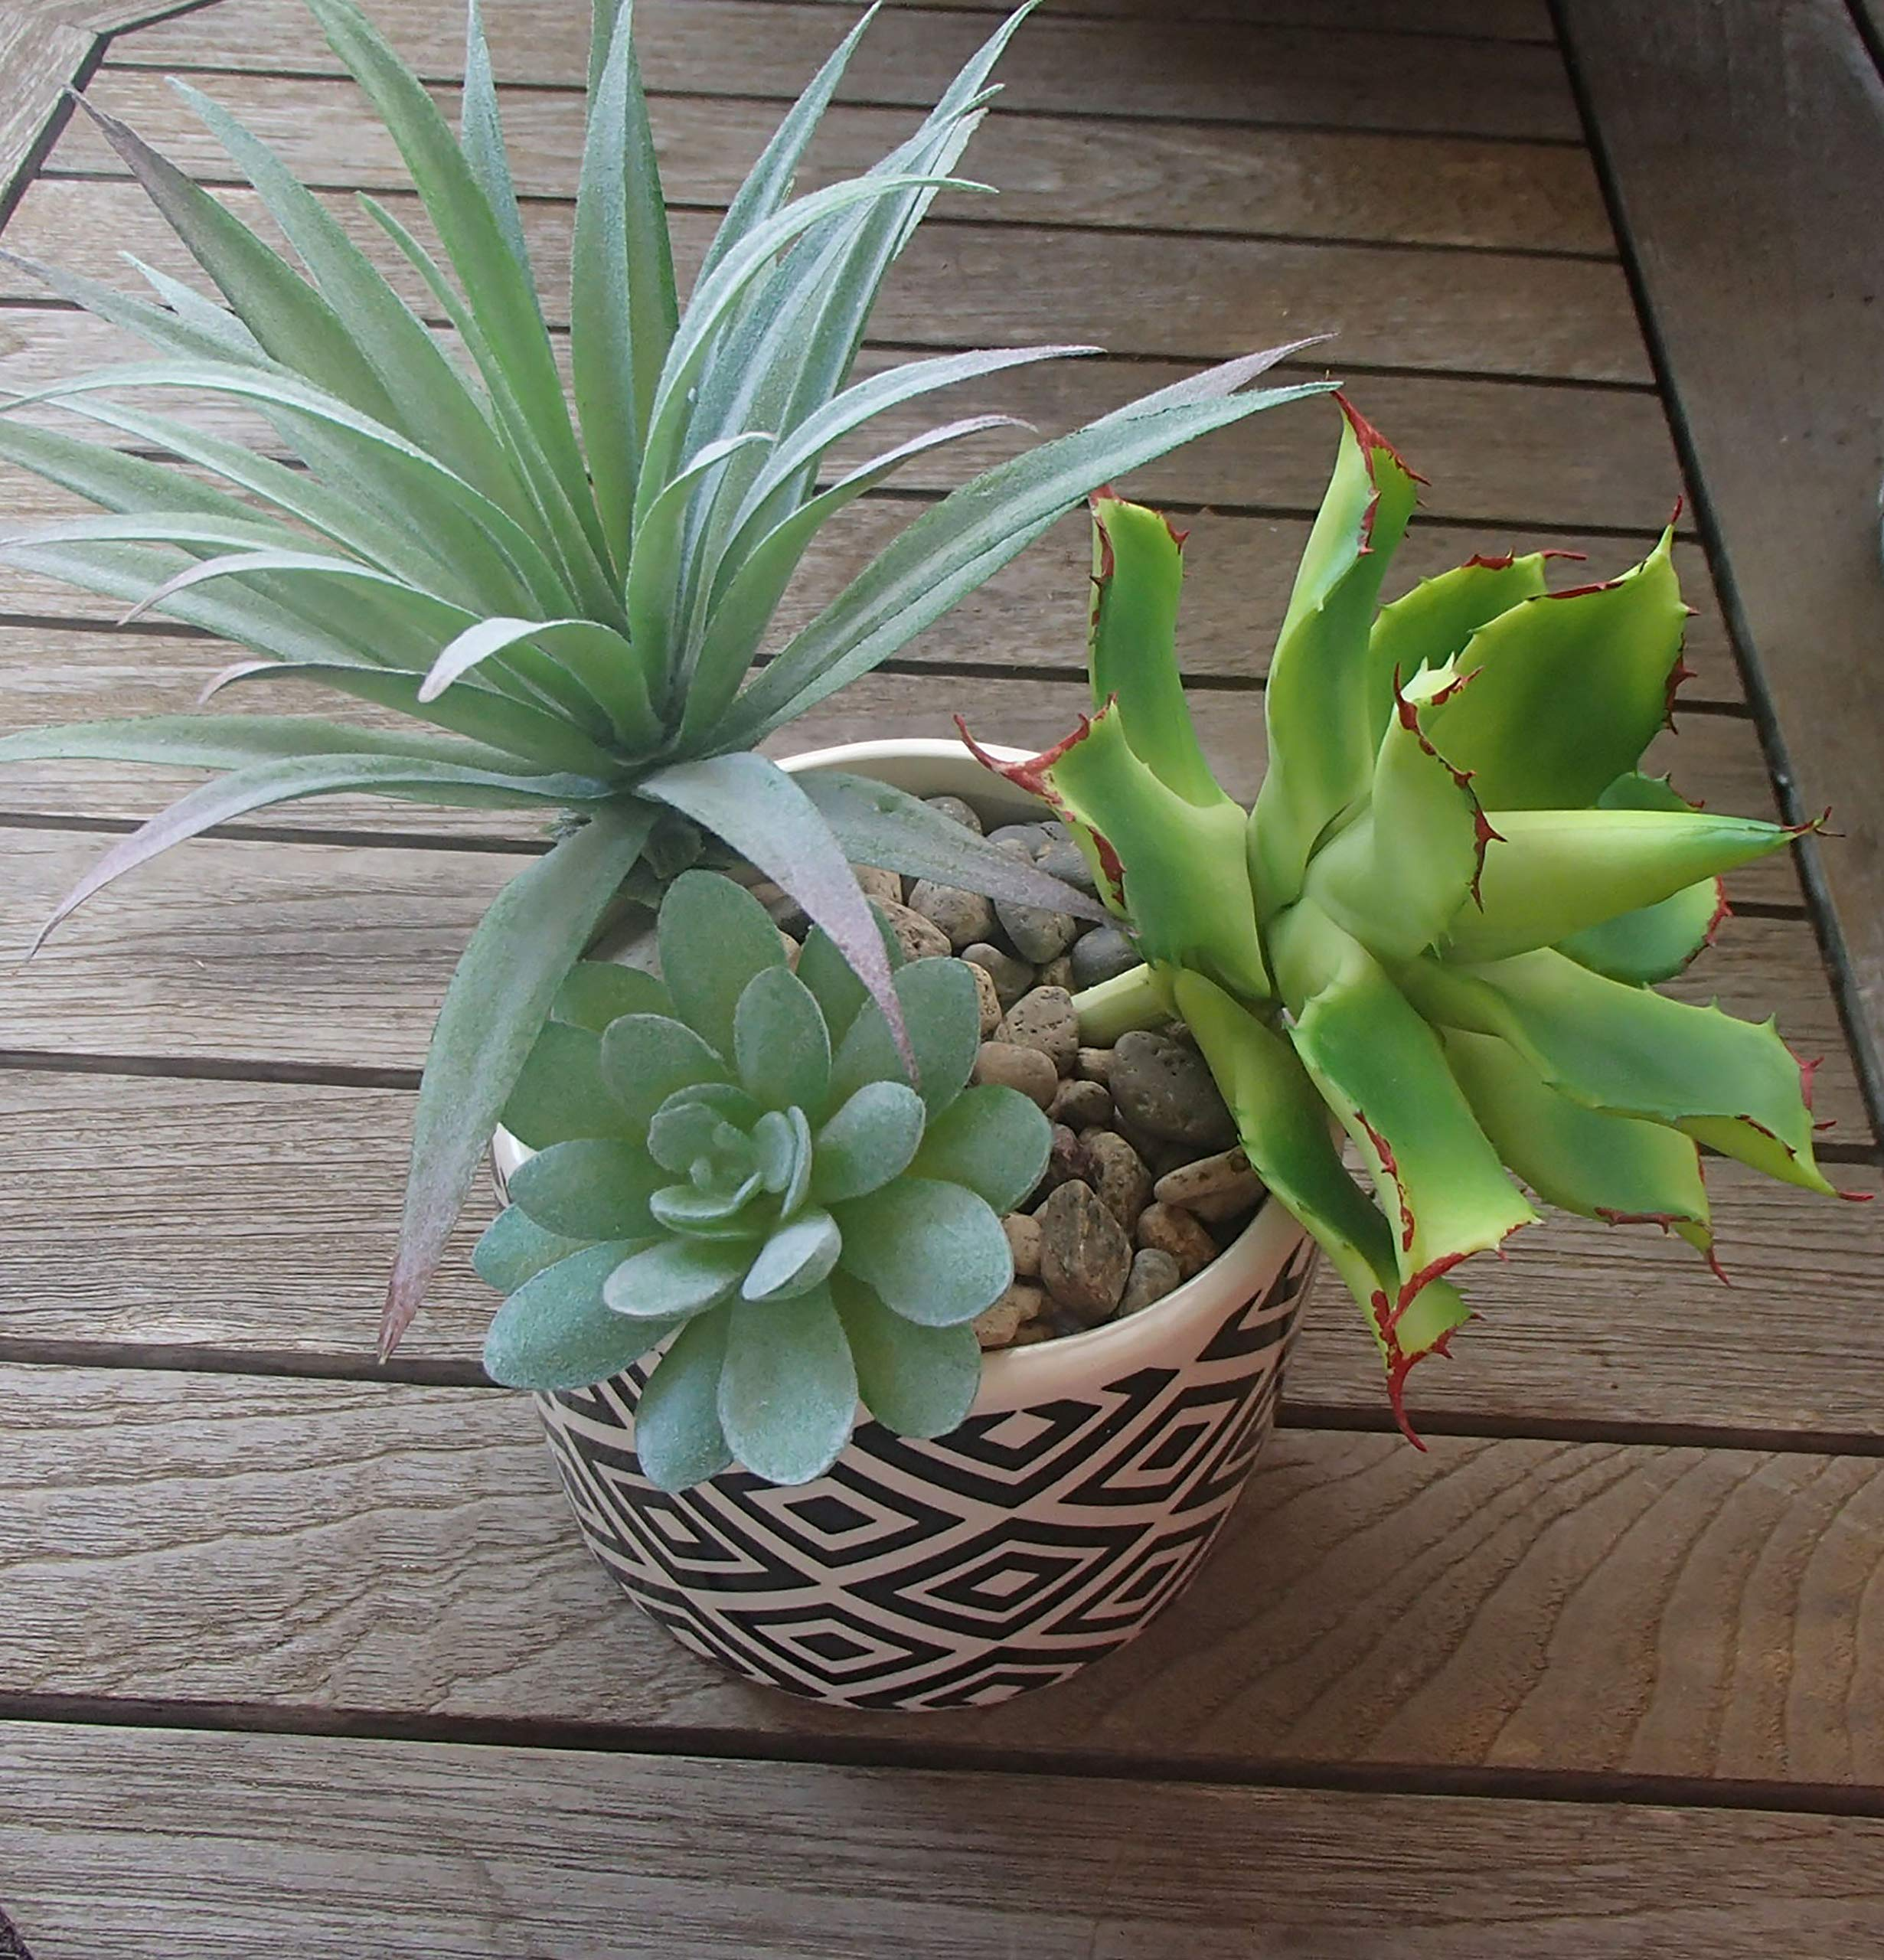 Daisy-Lane-6-Pcs-Artificial-Succulent-Arrangement-Unpotted-Fake-Succulents-in-Different-Sizes-Faux-Succulent-Plants-for-Floral-Arrangement-Home-or-Party-Dcor-Wedding-Centerpiece-or-DIY